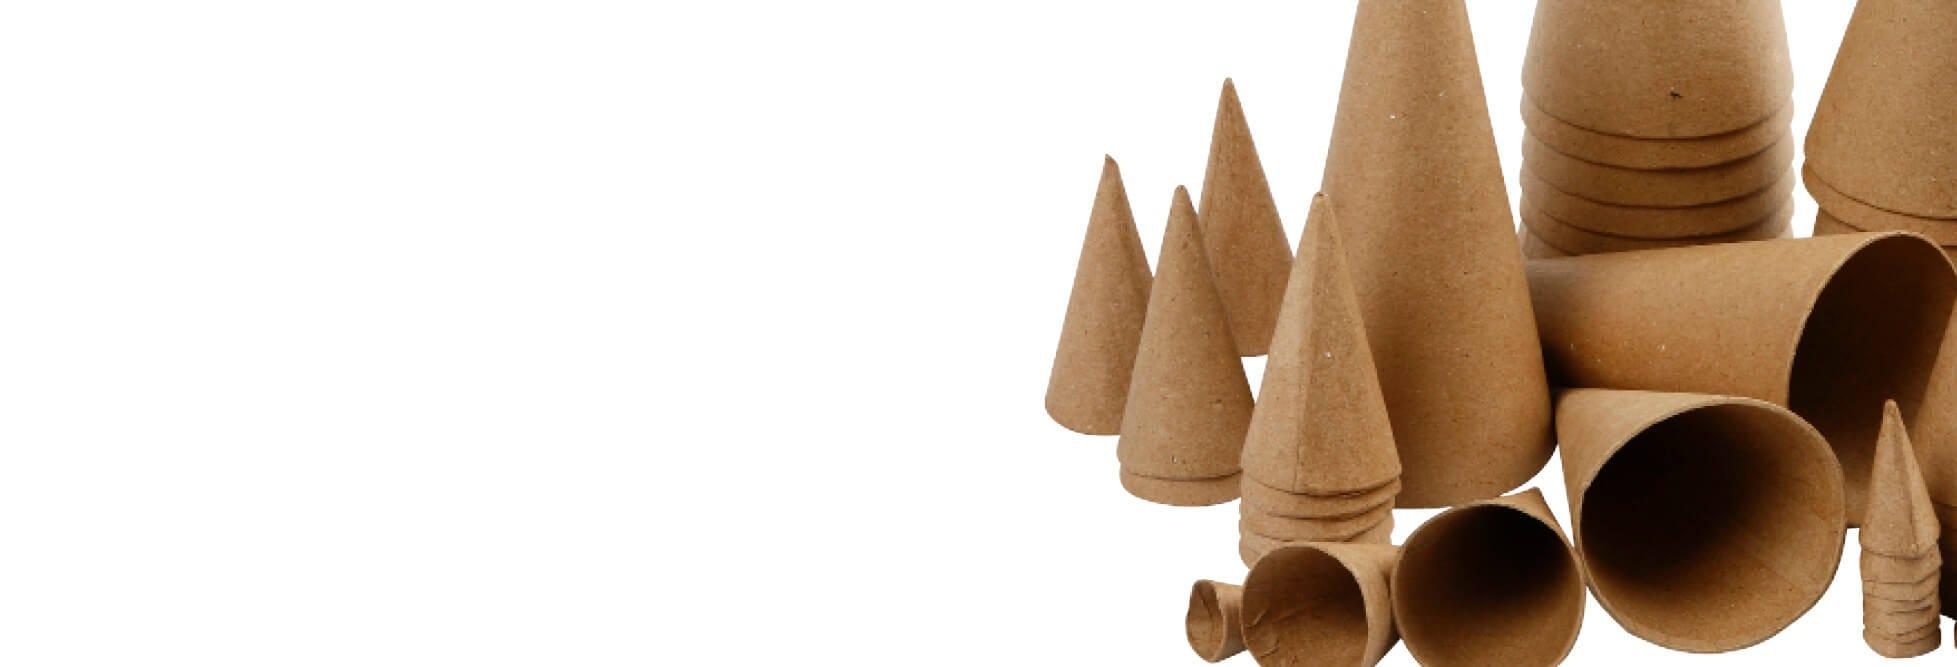 Decorative Christmas cones and cornets